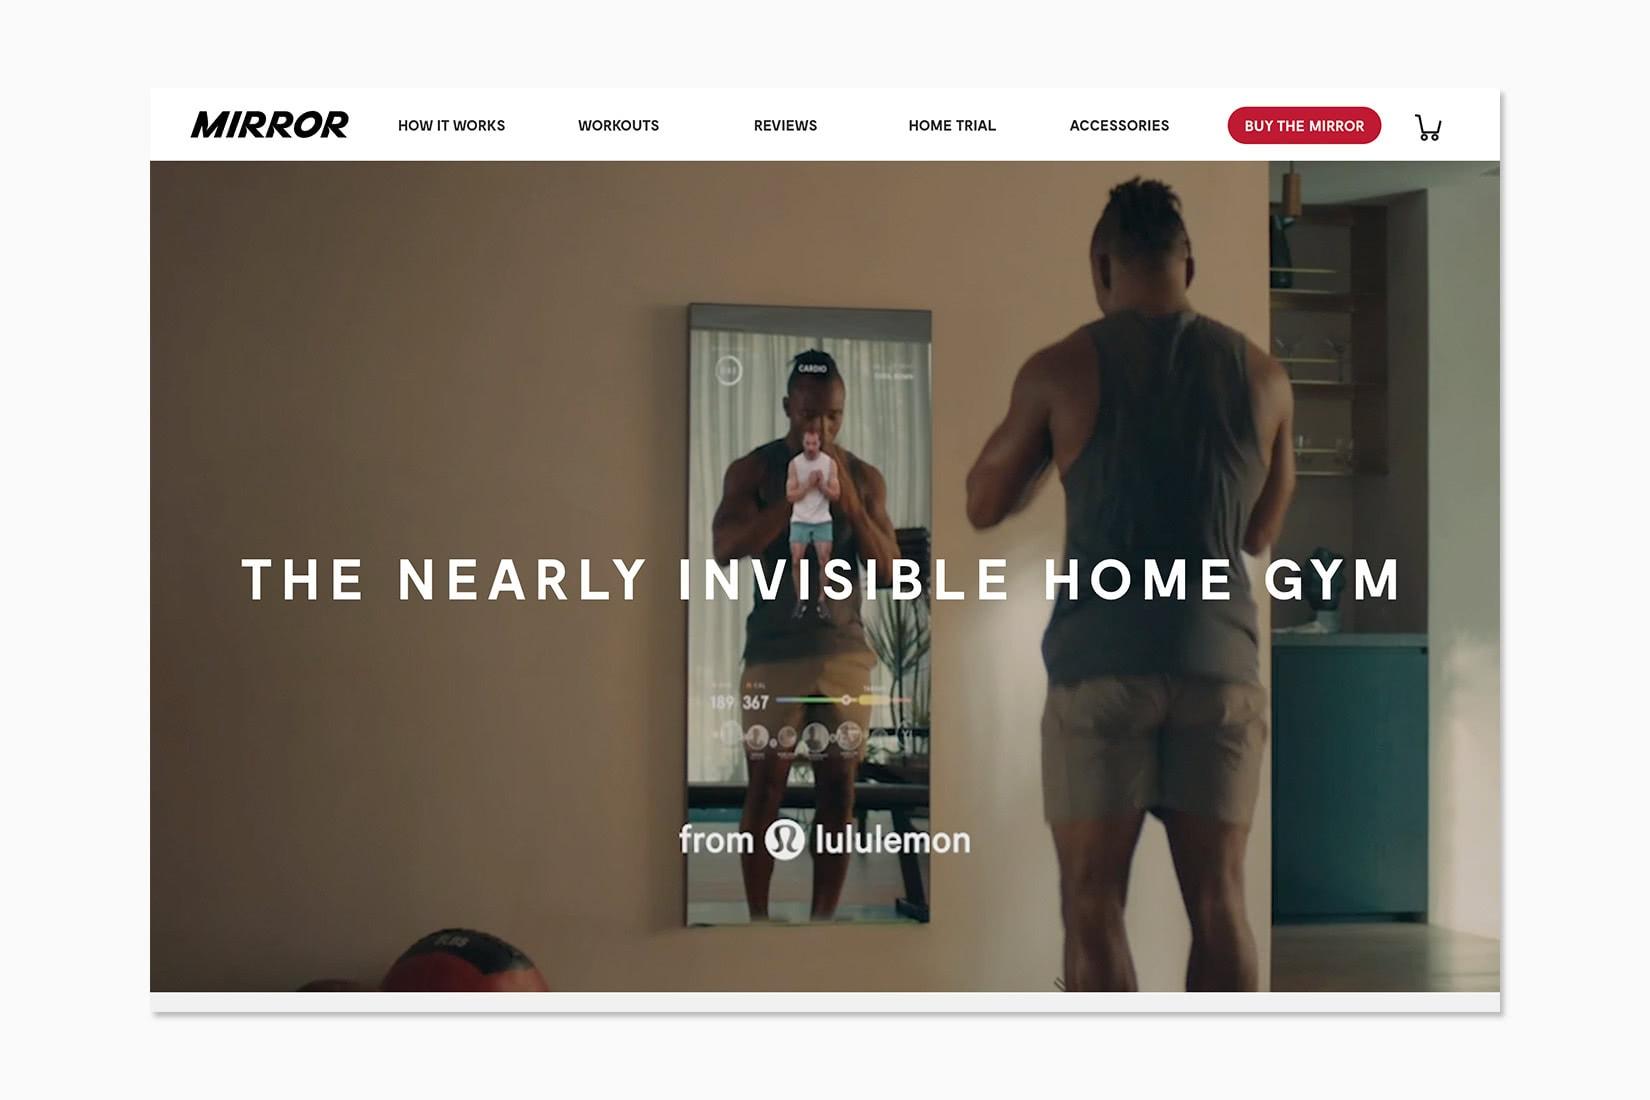 best online workout program mirror review - Luxe Digital